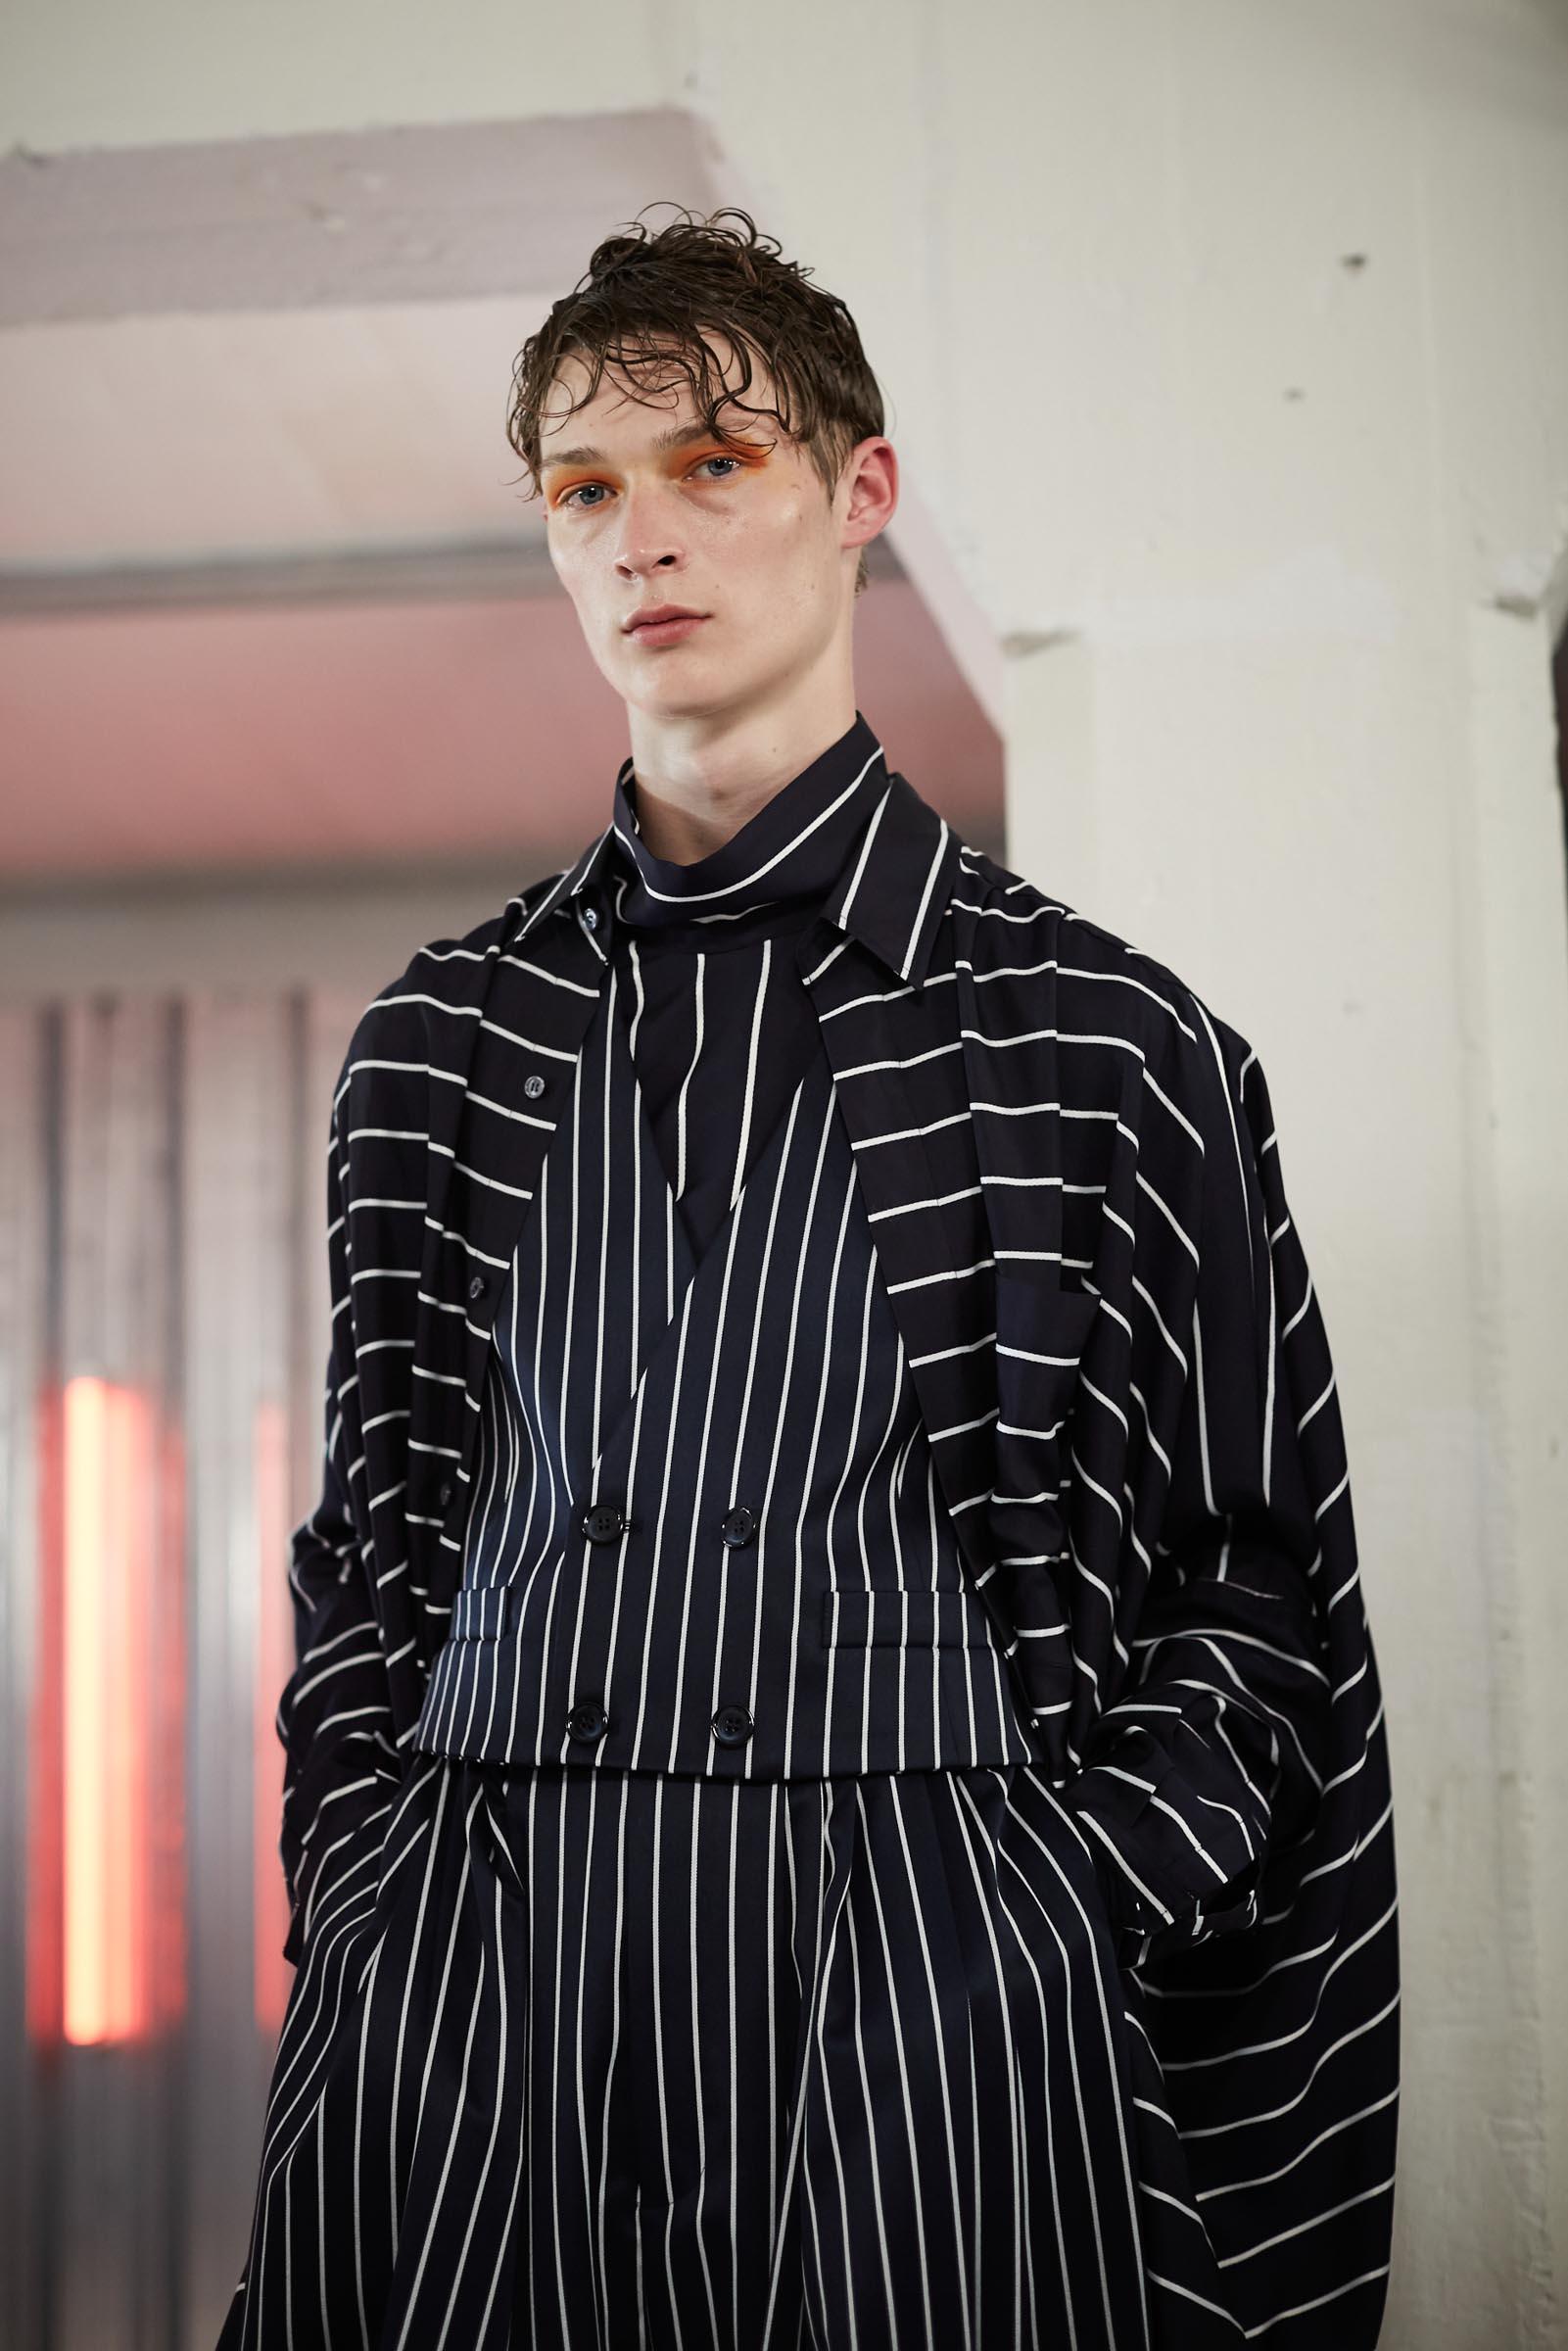 Topman Design SS18, Presentation (Shaun James Cox, British Fashion Council)